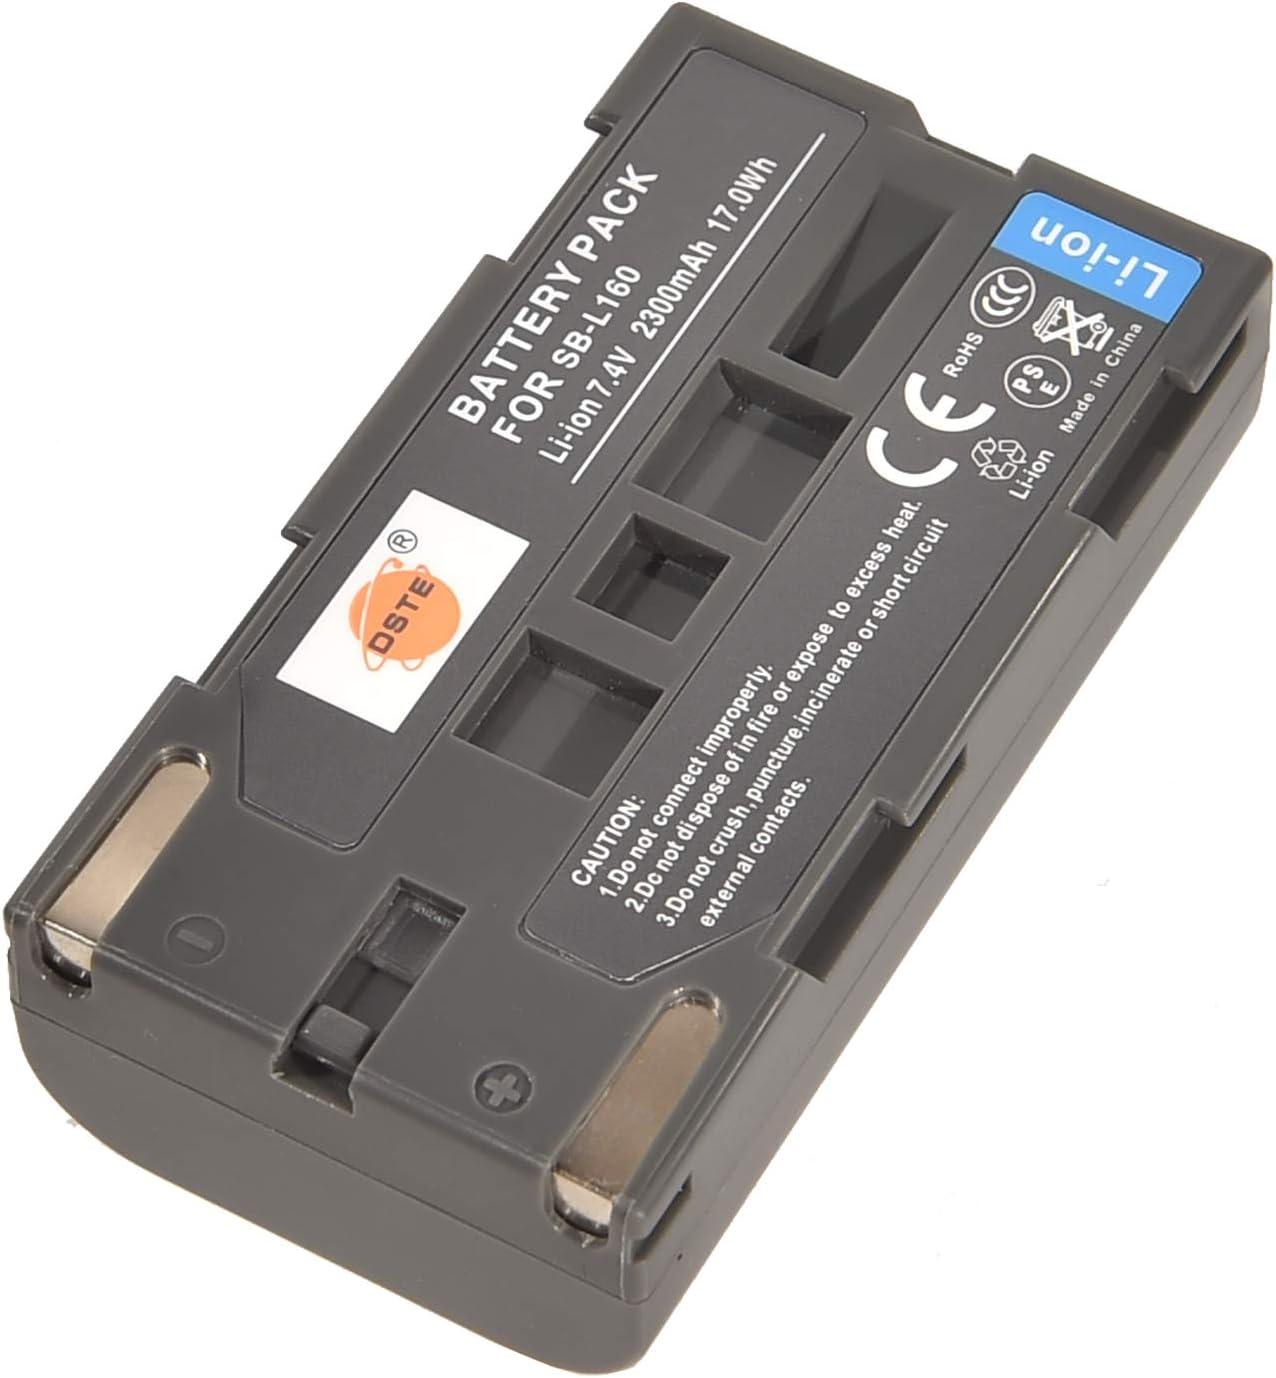 Batería Li-ion tipo sb-l160 para Samsung vp-l700u l710 l750